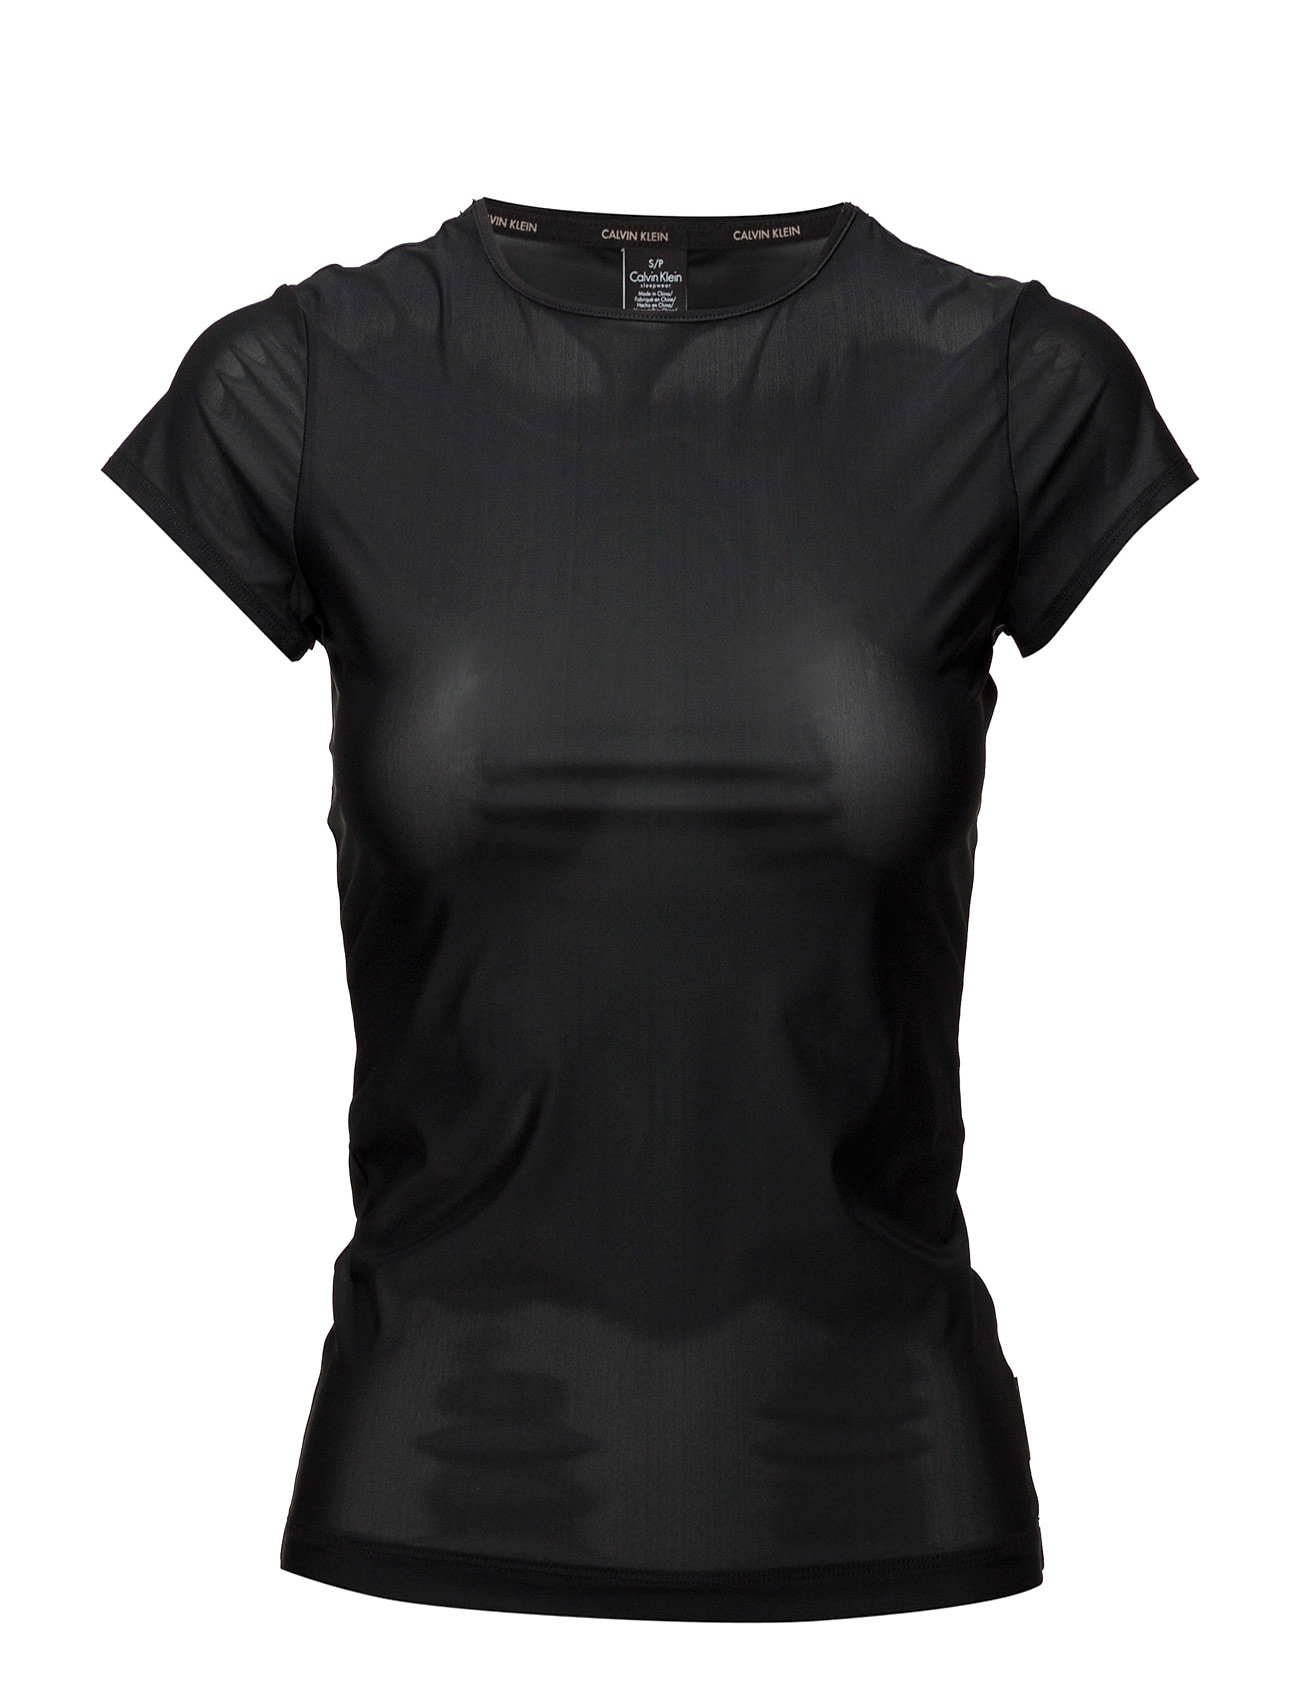 Calvin Klein TOP CREW NECK SHORT SLEEVE - BLACK